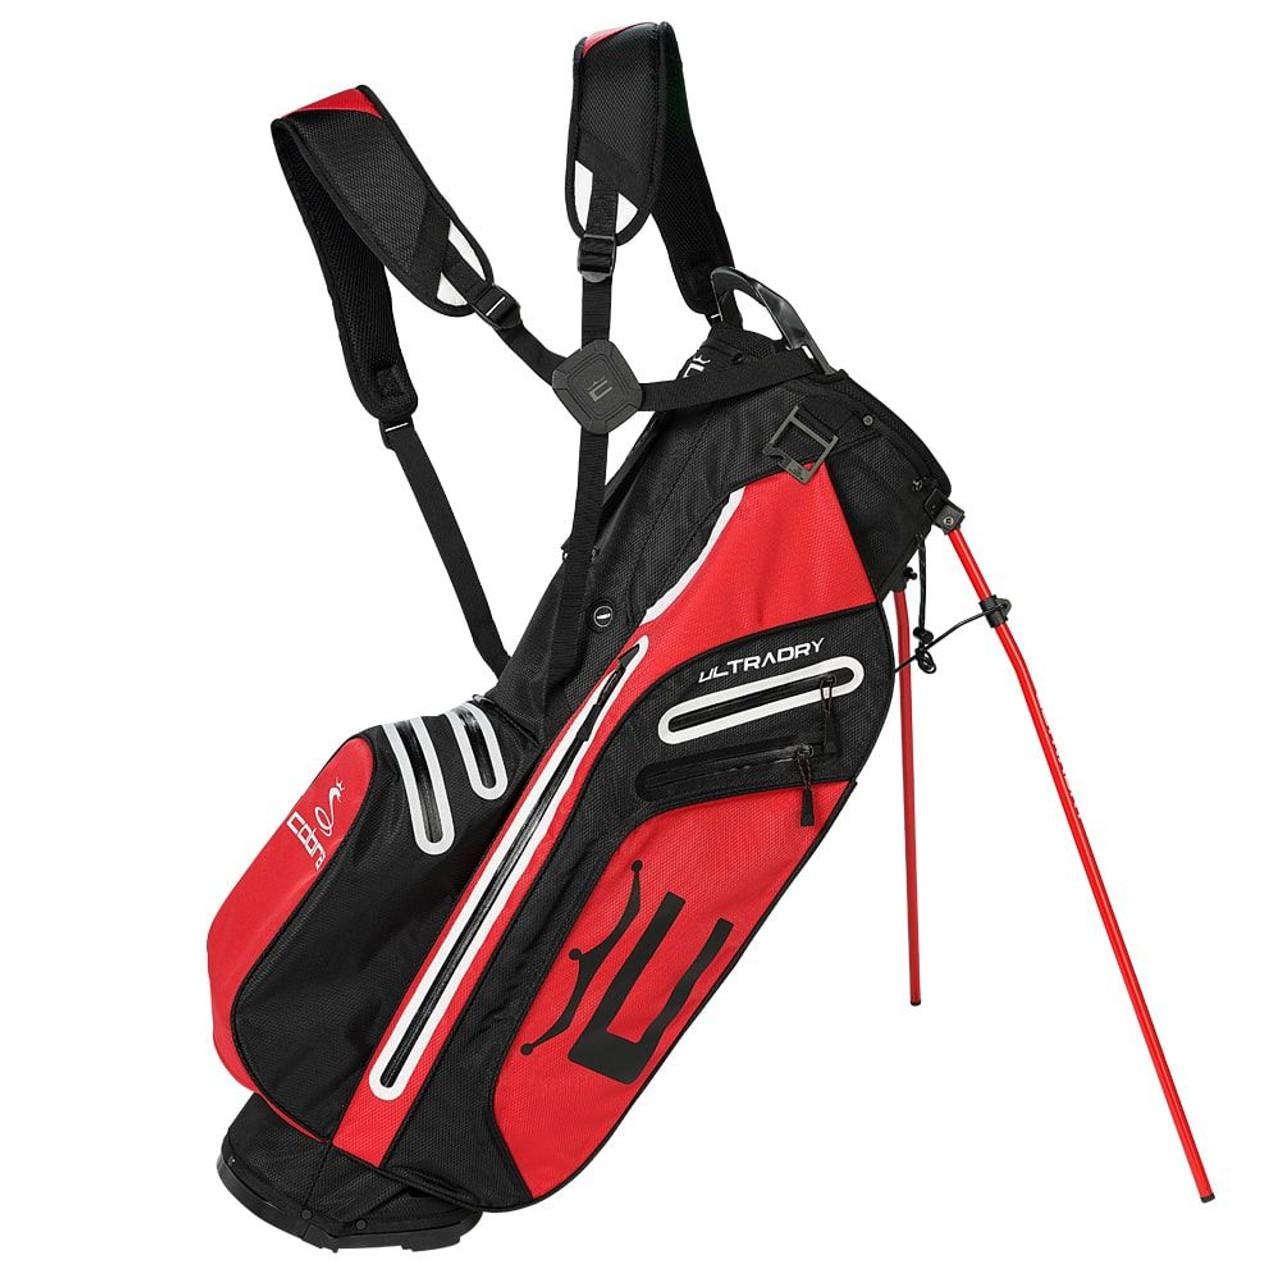 Cobra UltraDry Pro Stand Bag - Black / High Risk Red